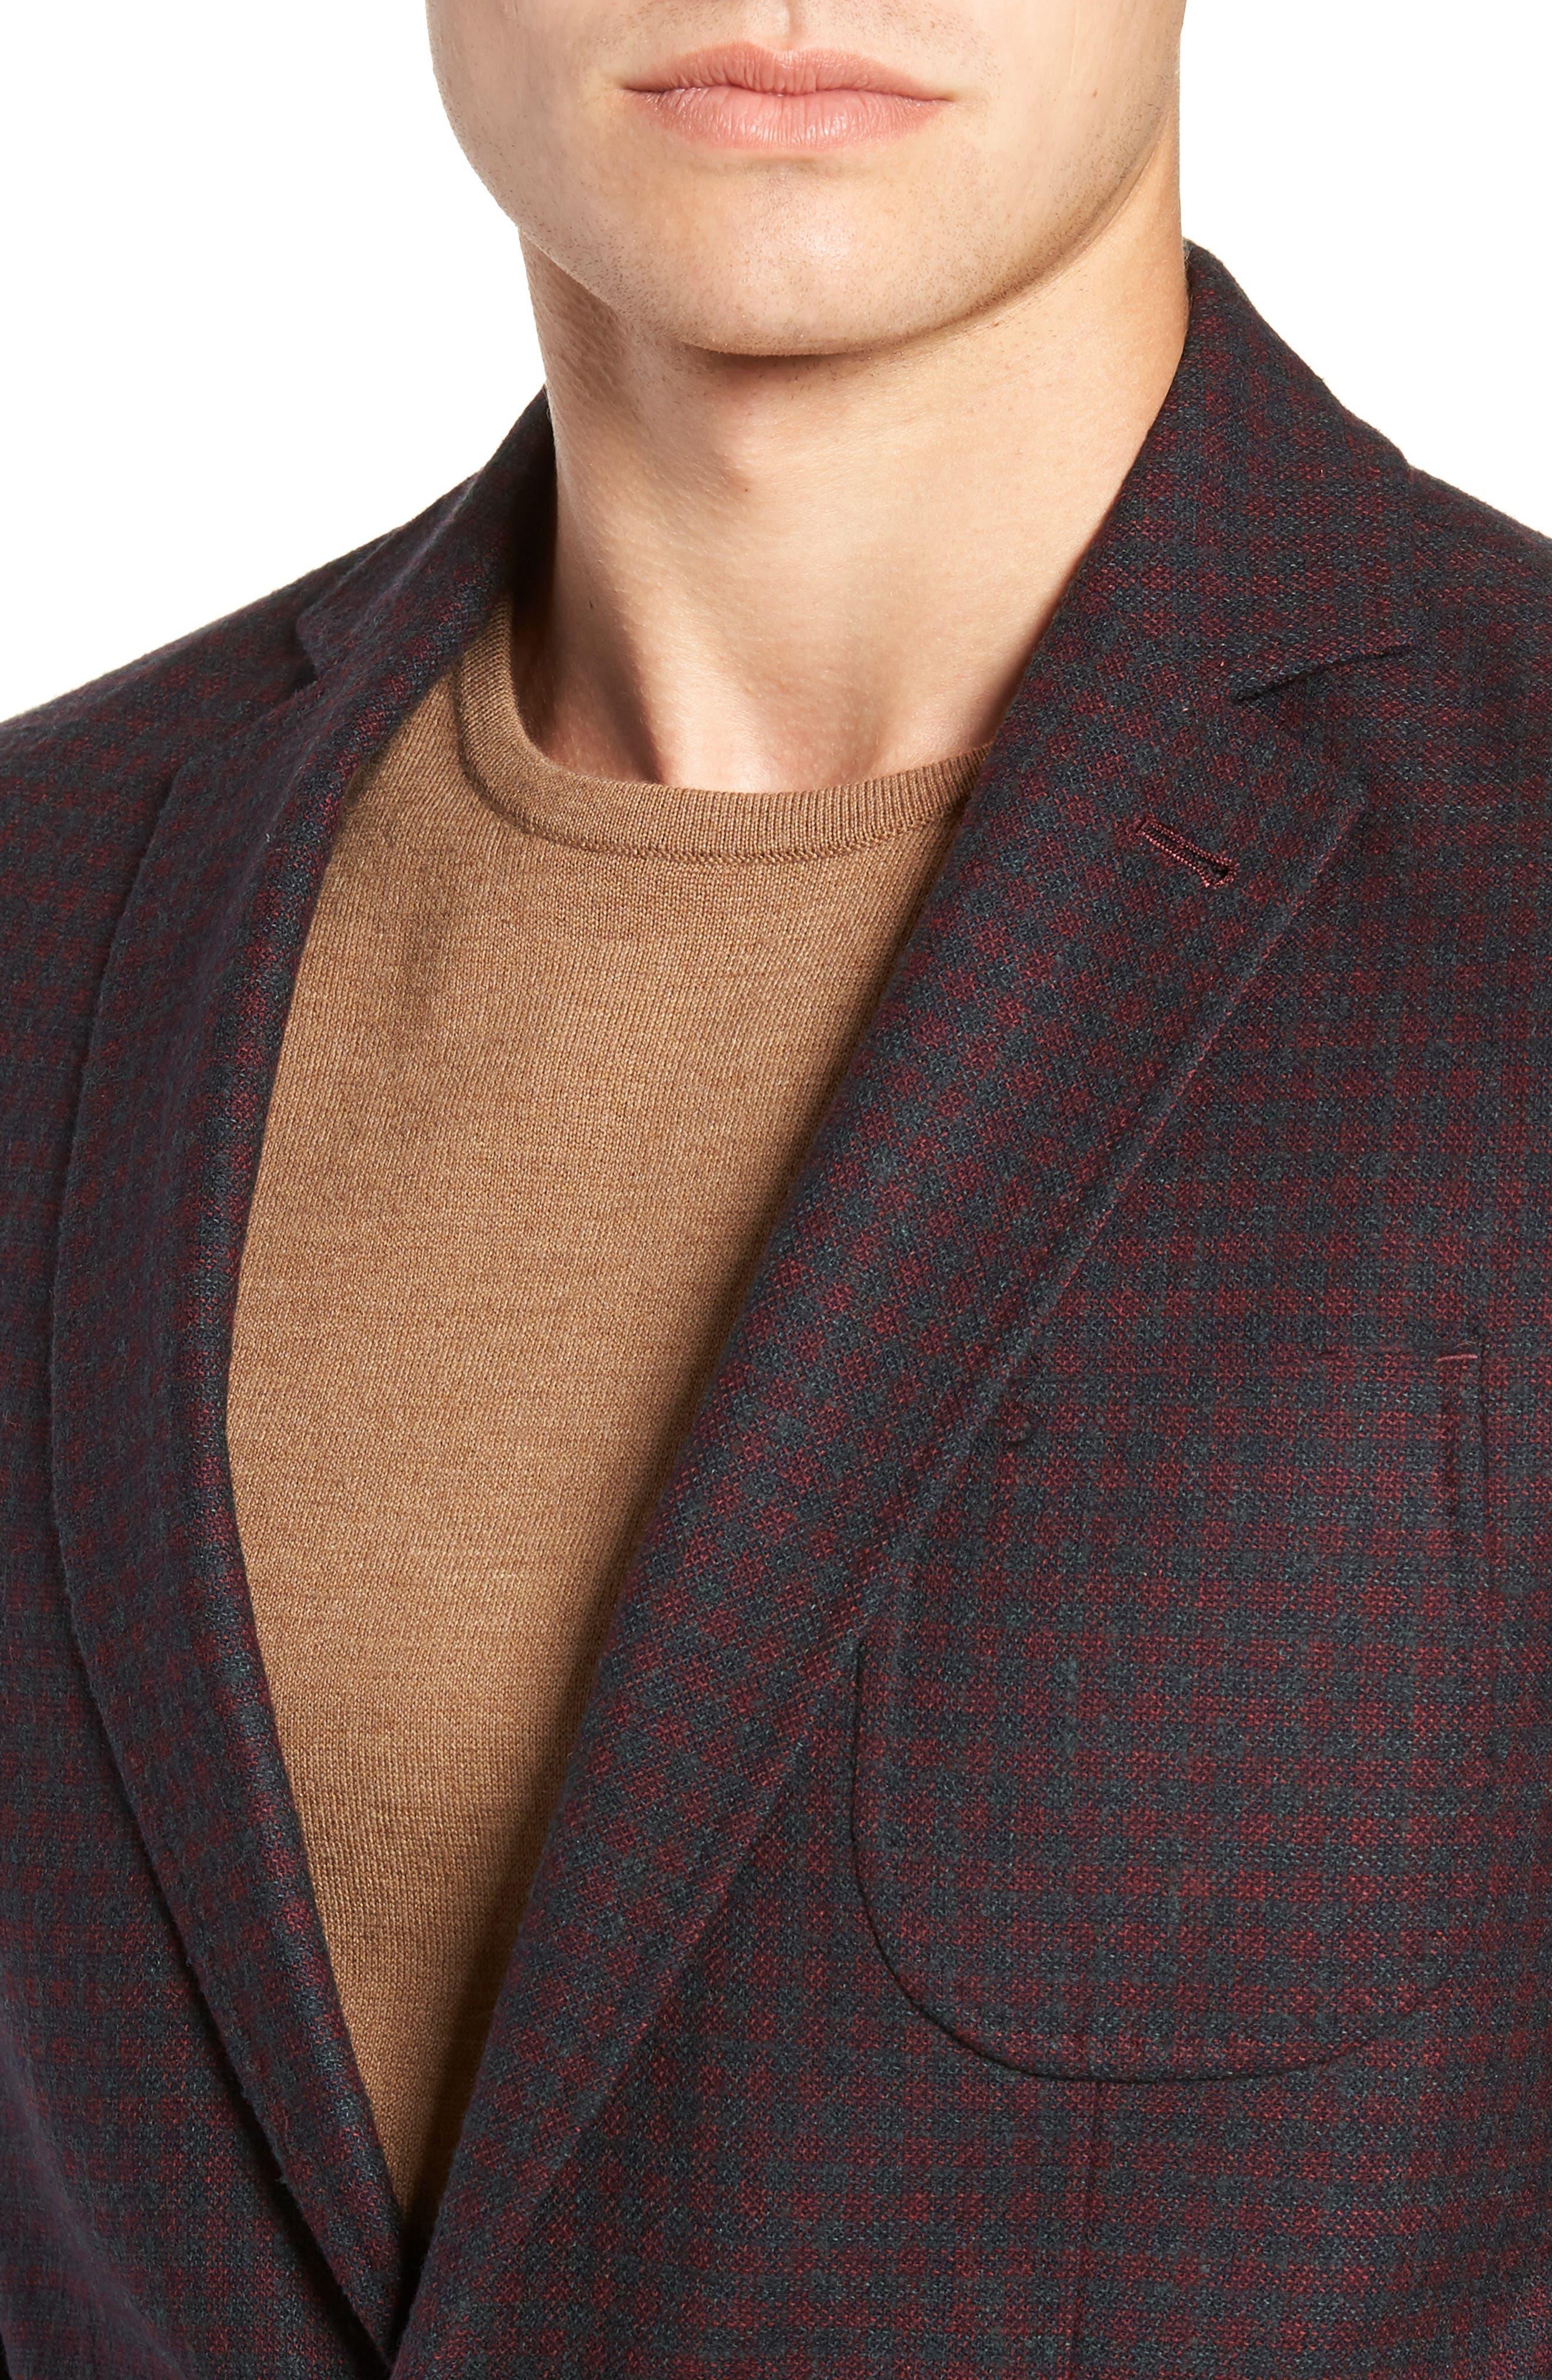 Regular Fit Wool Blend Sport Coat,                             Alternate thumbnail 4, color,                             RED